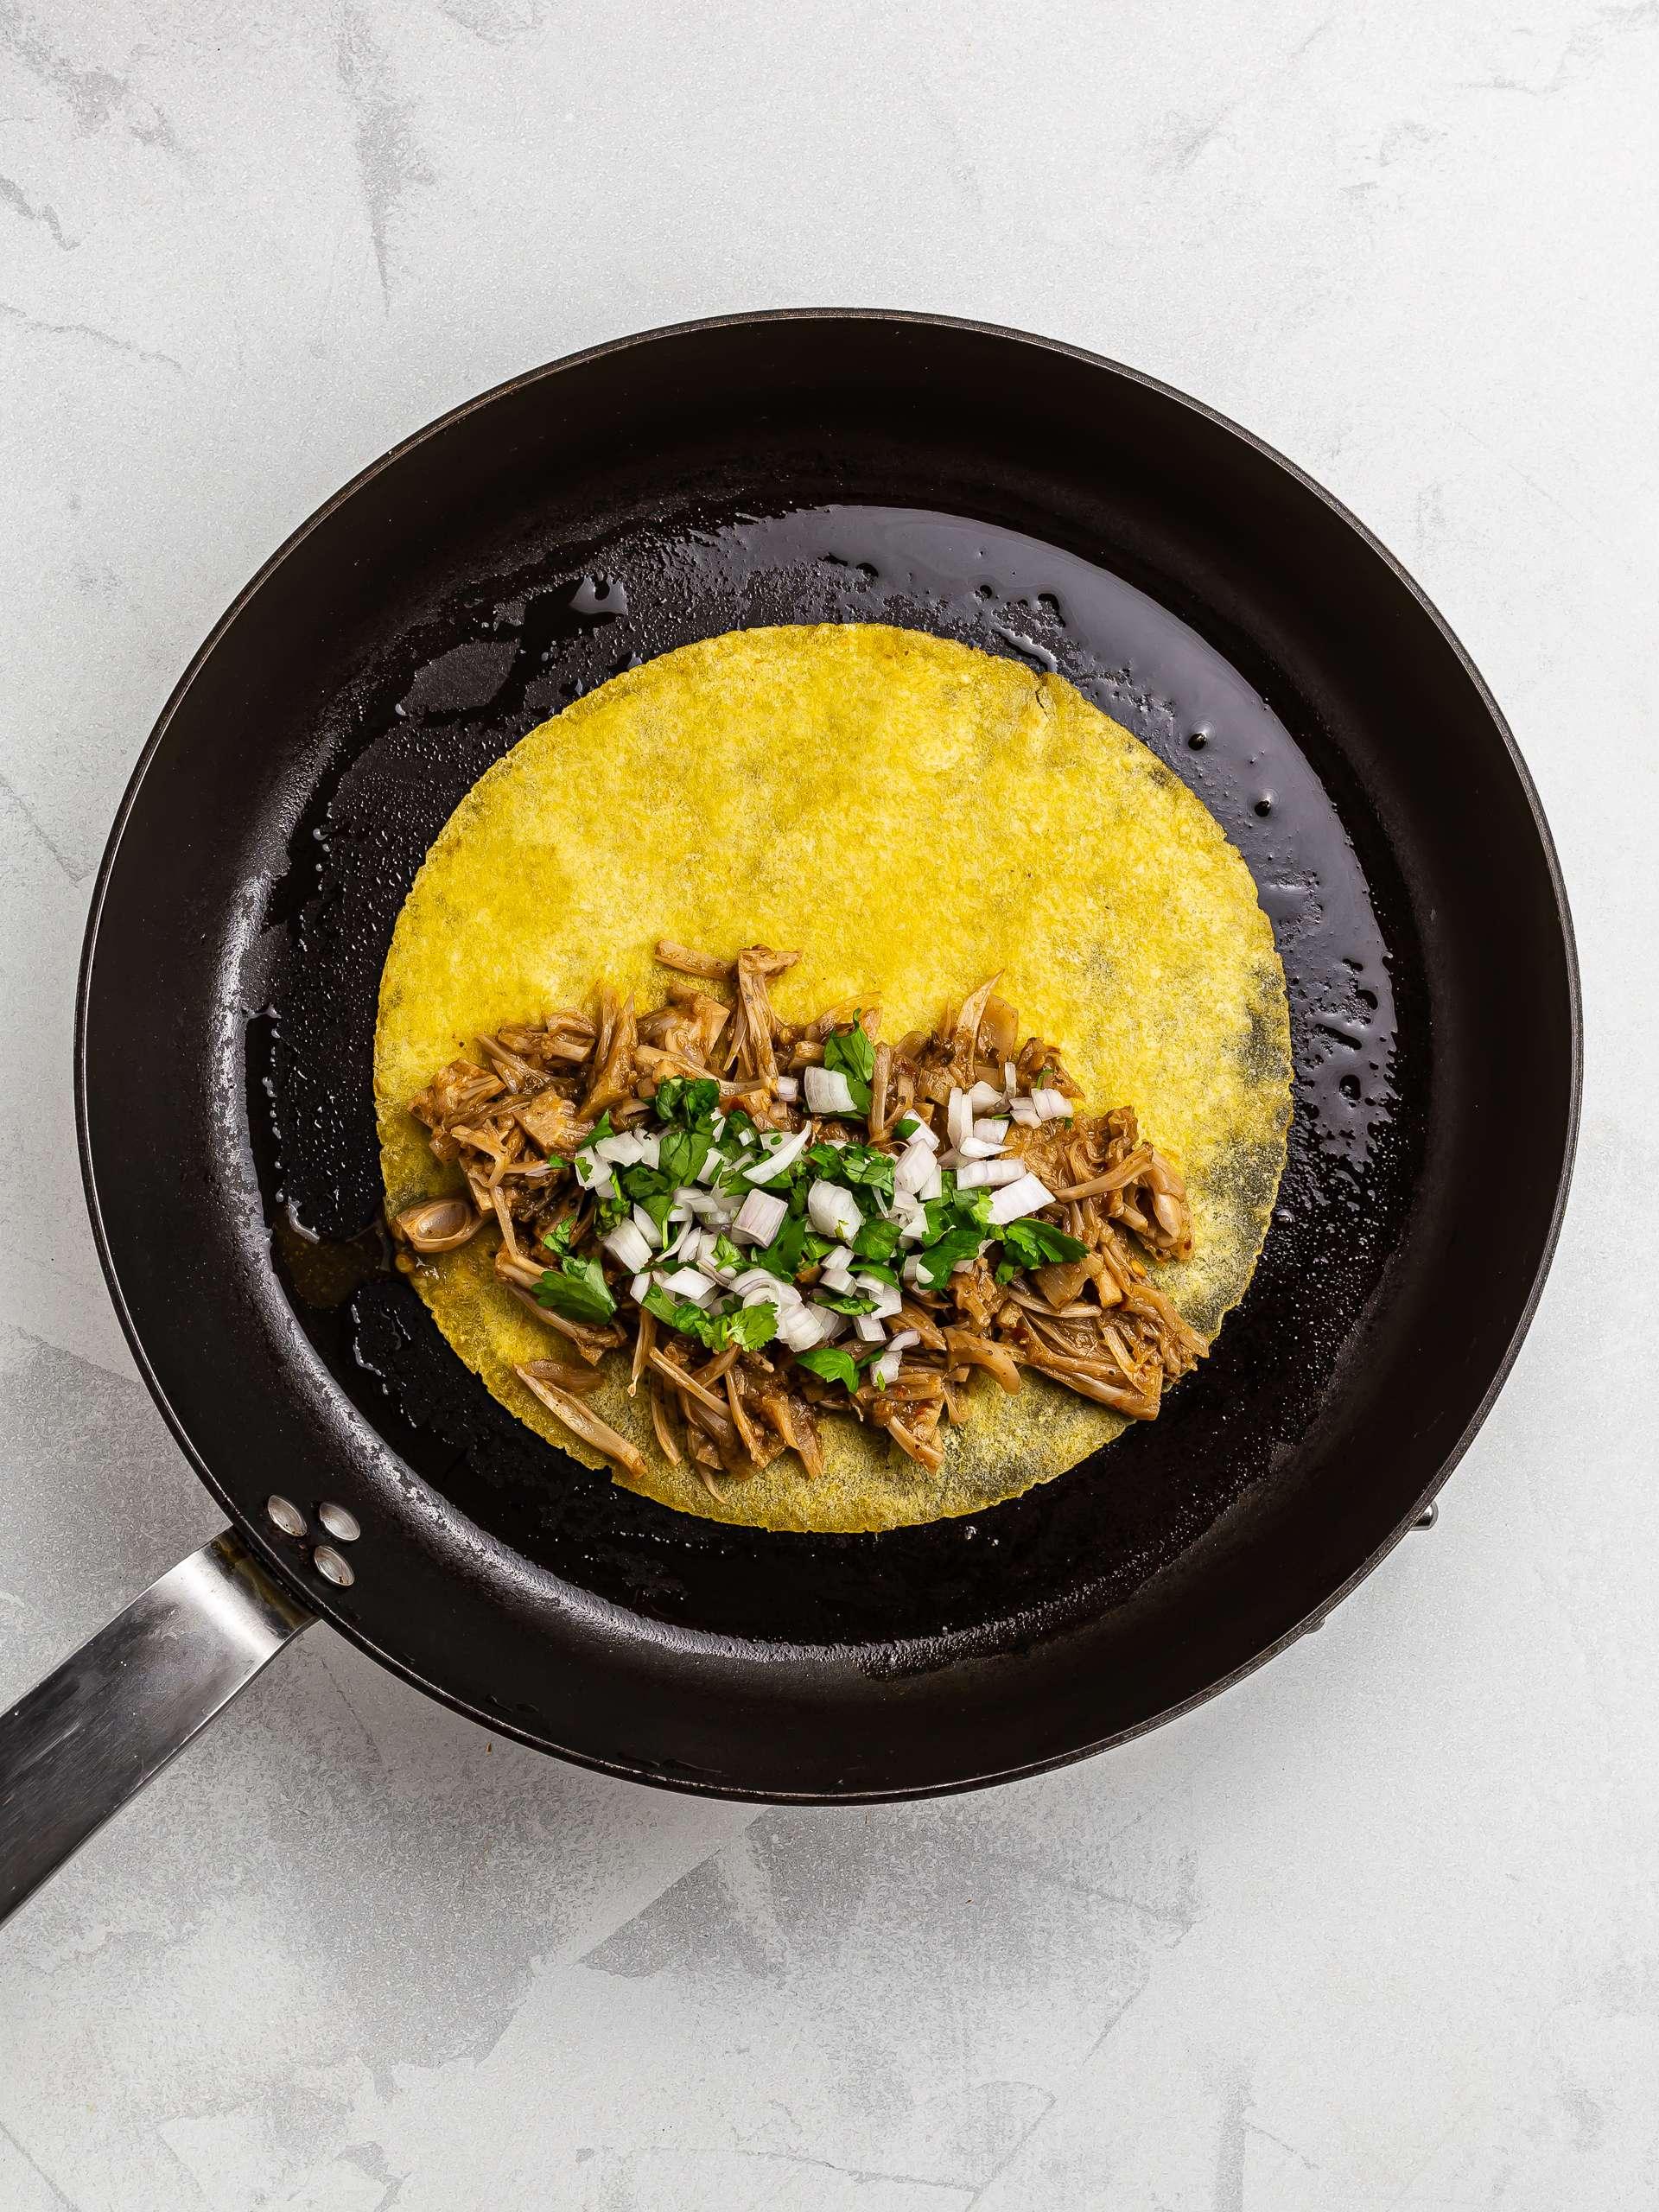 cooking jackfruit birria tacos in a skillet